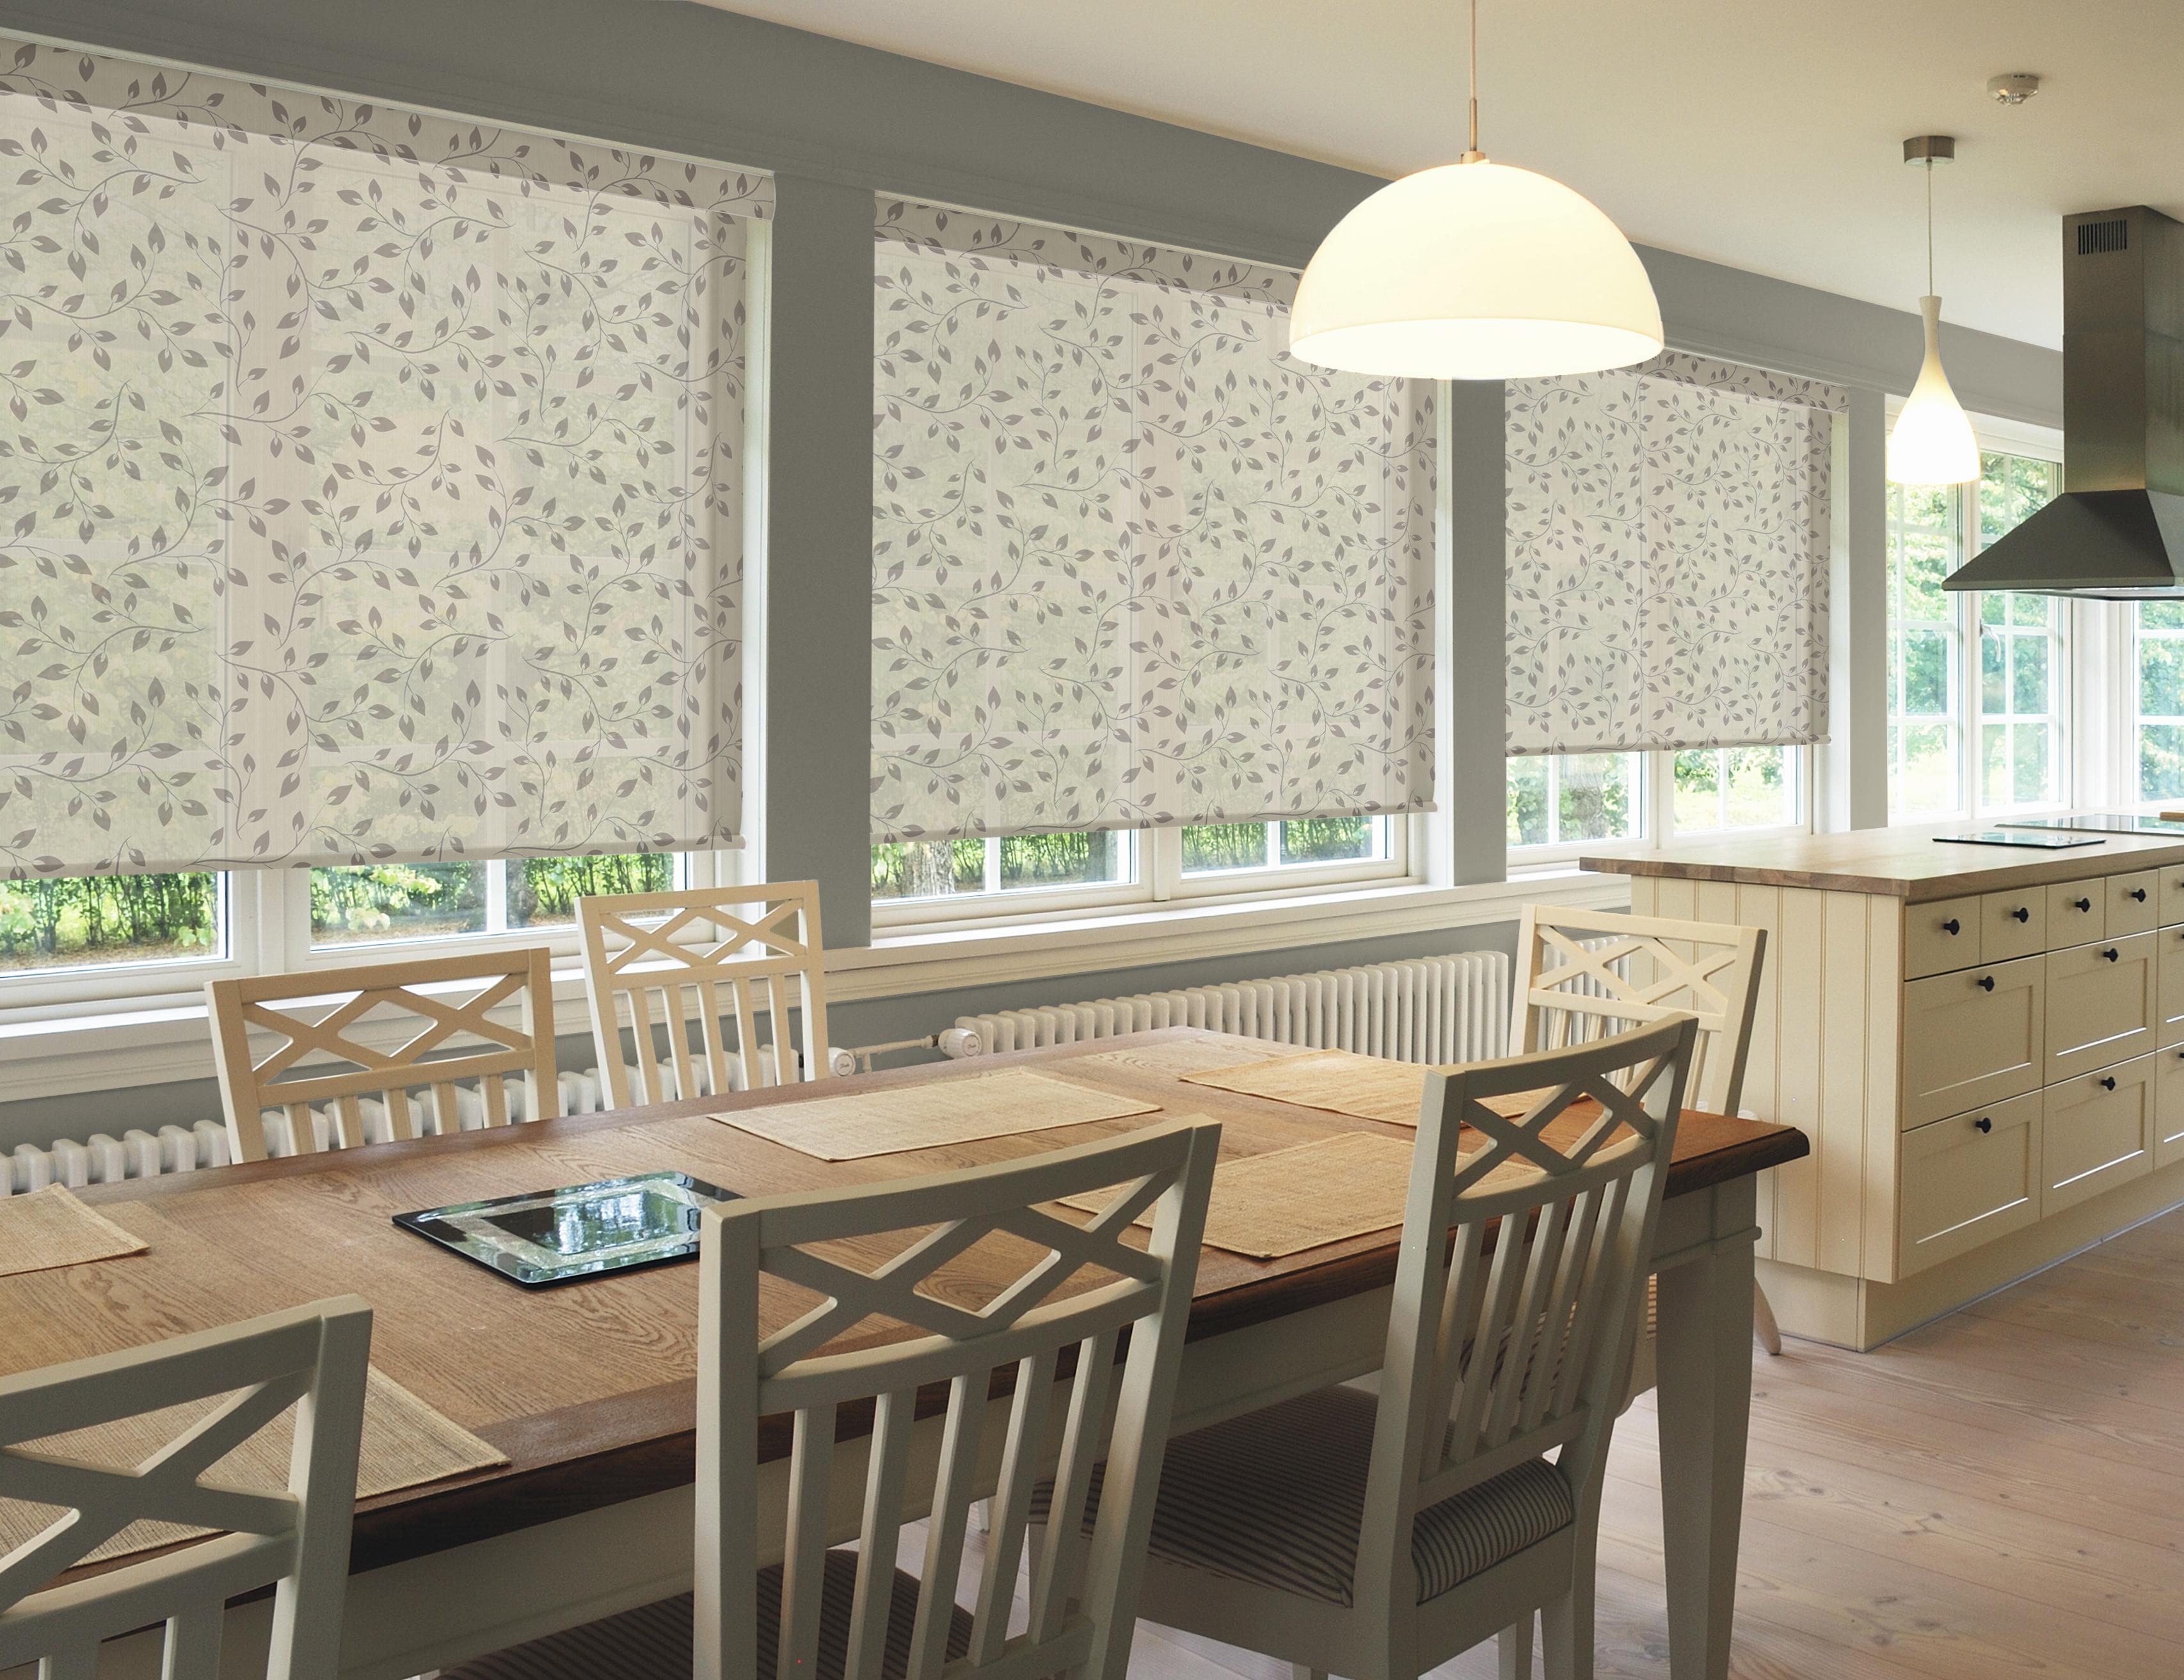 Inside mount window treatments - Summerdays_roomshot